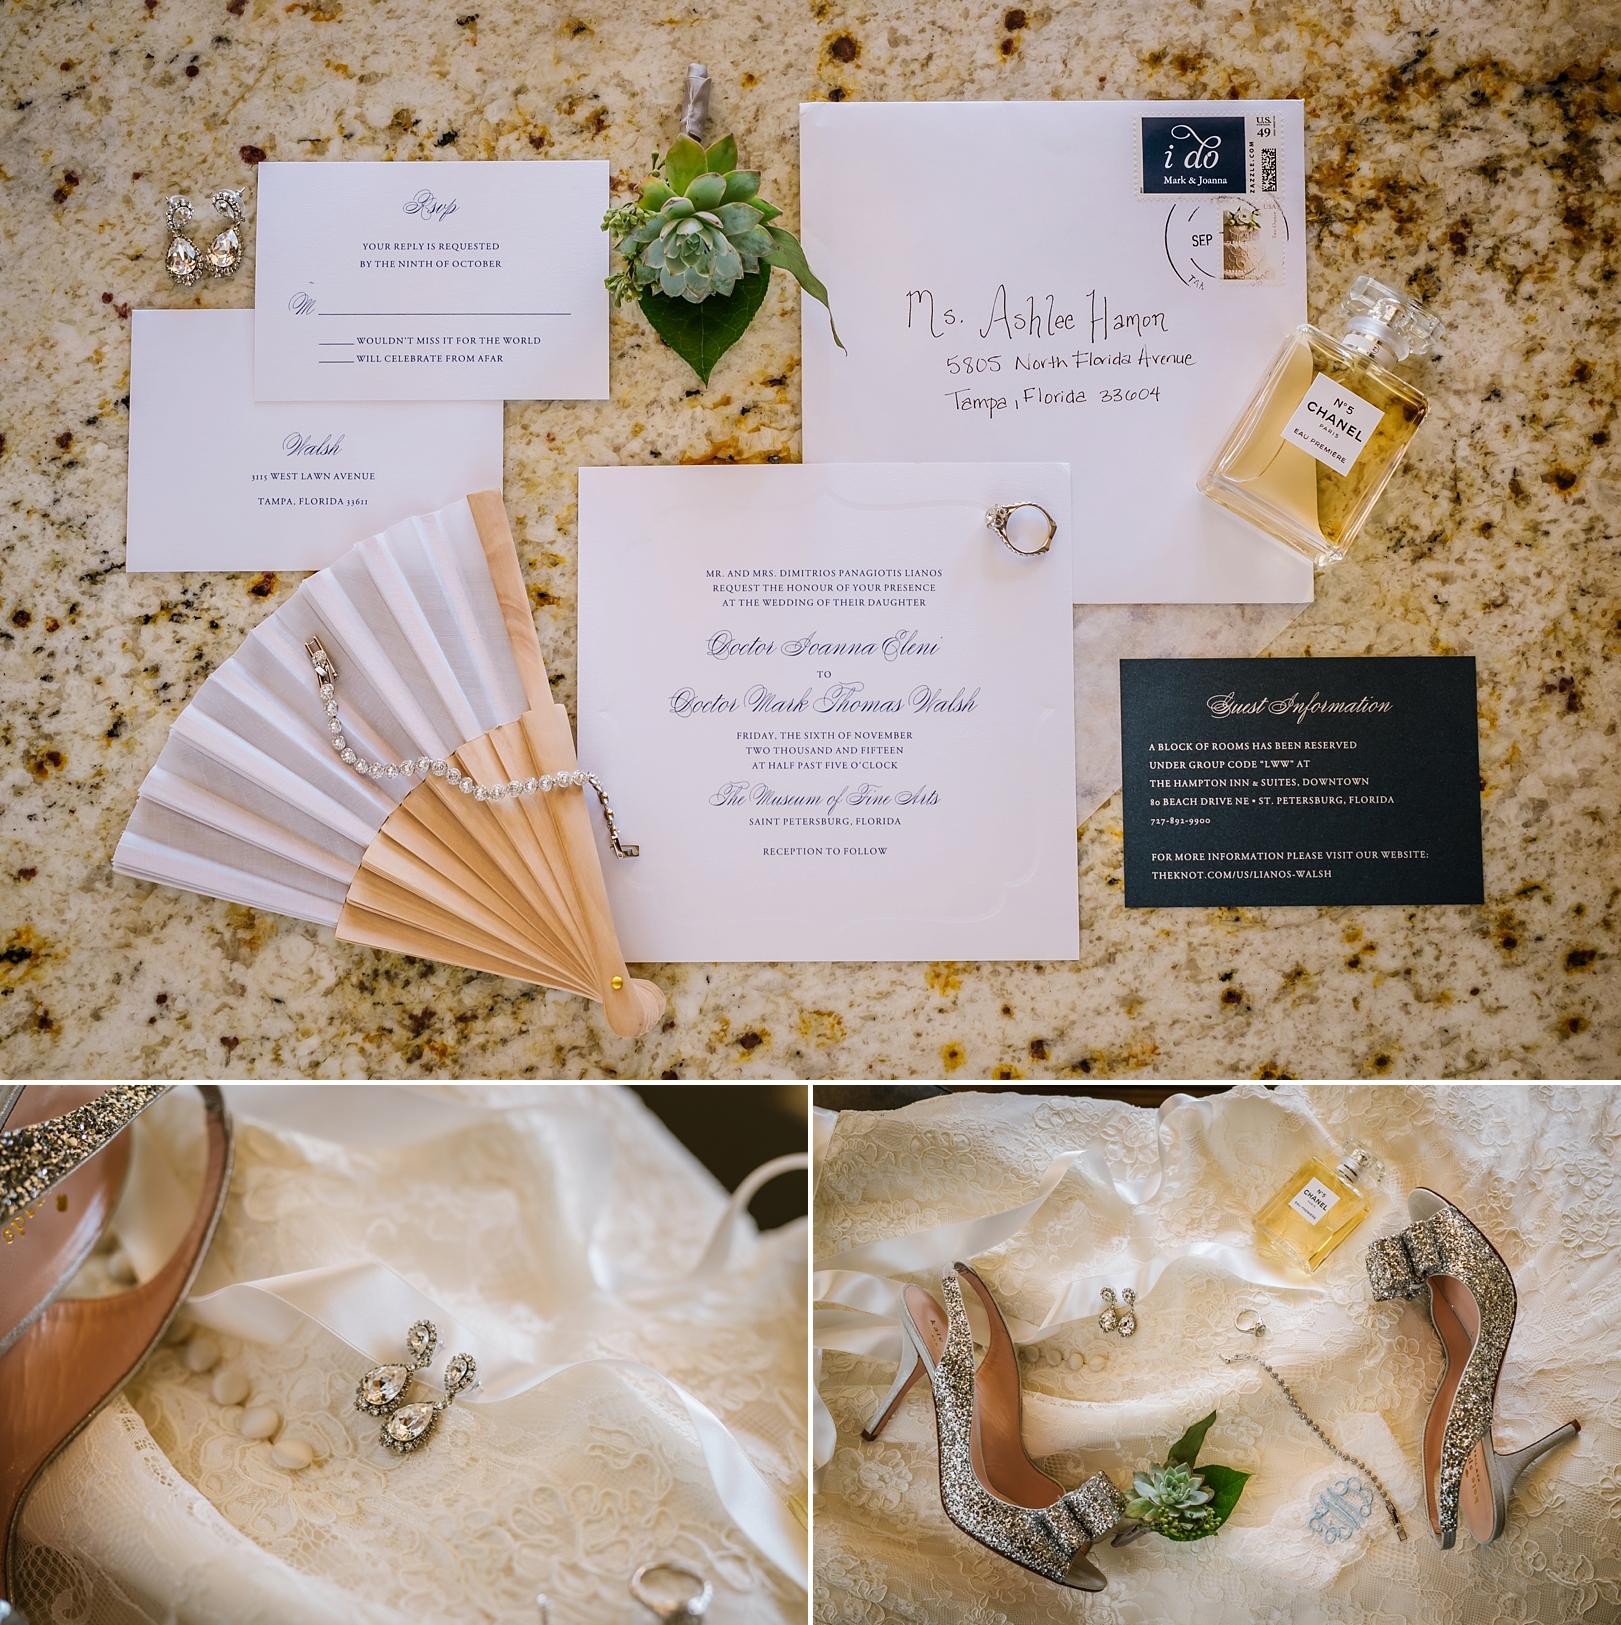 st-pete-art-museum-wedding-vinoy-ashlee-hamon-photography_0001.jpg